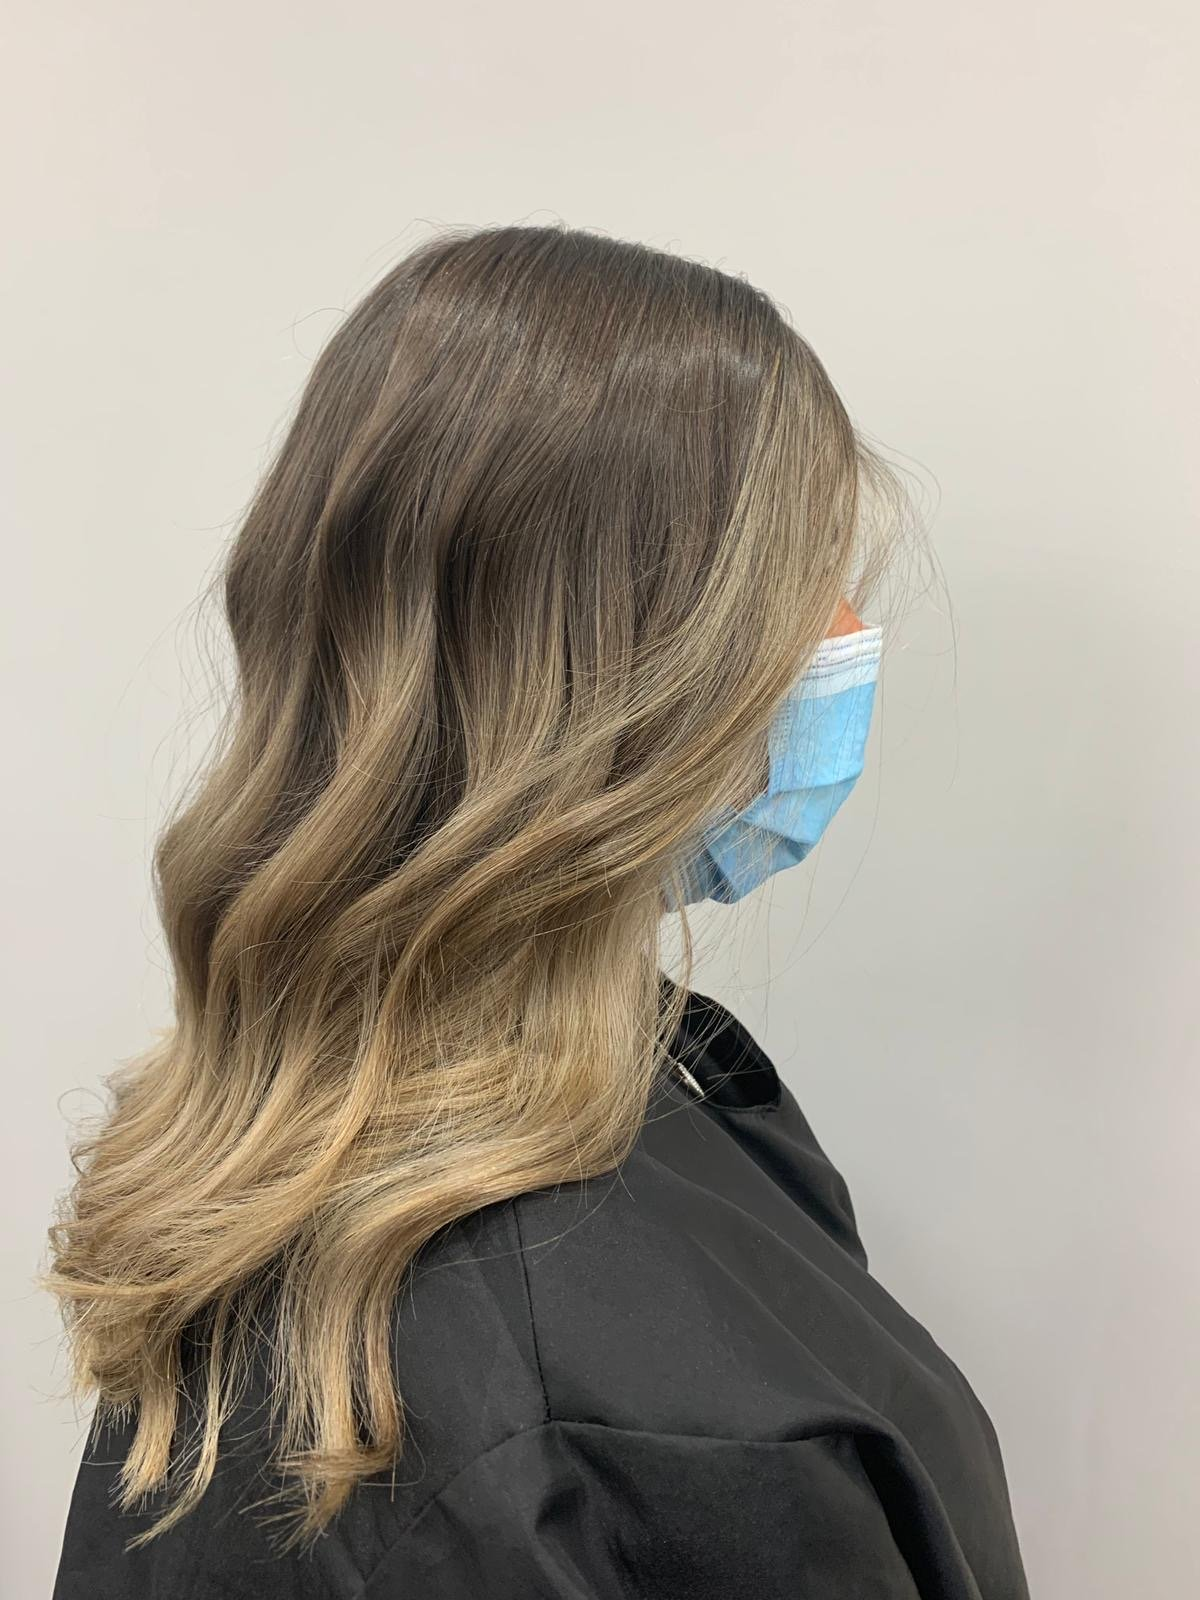 coronavirus safe hair salon, hair lab in woking